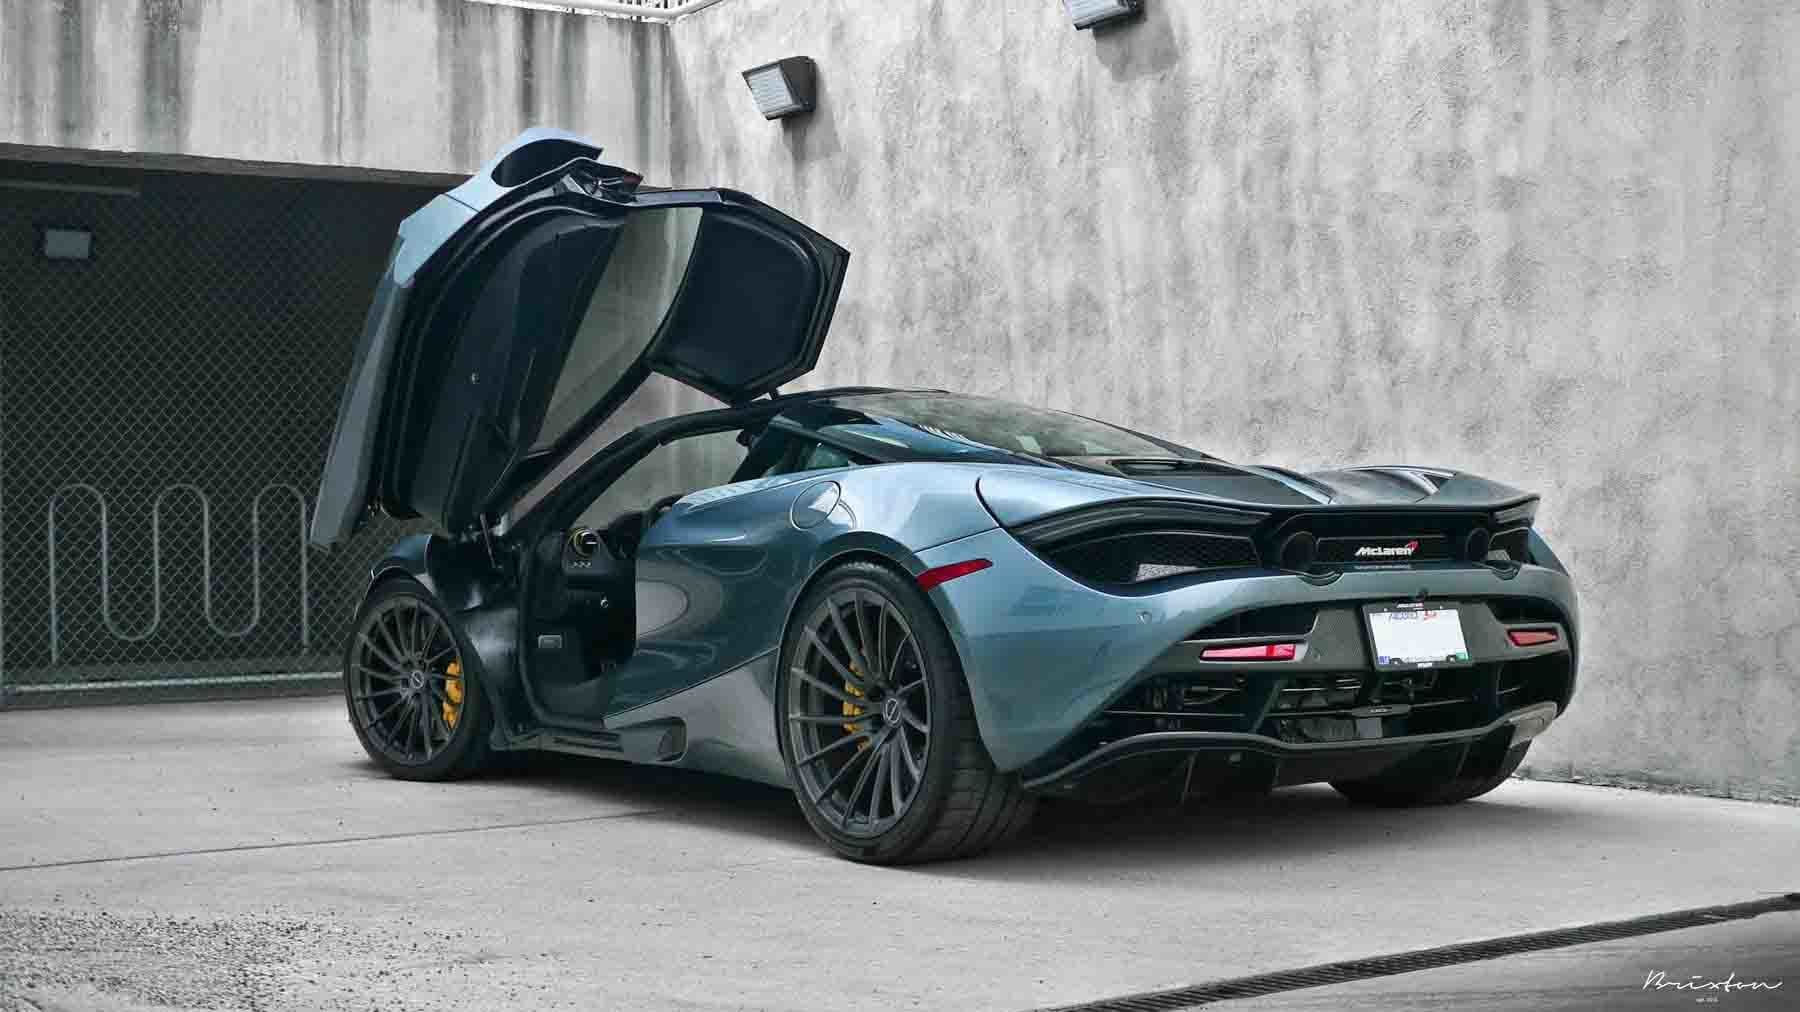 images-products-1-2912-232975200-polaris-blue-mclaren-720s-performance-brixton-forged-wheels-r15-ultrasport-1-piece-concave-brush.jpg